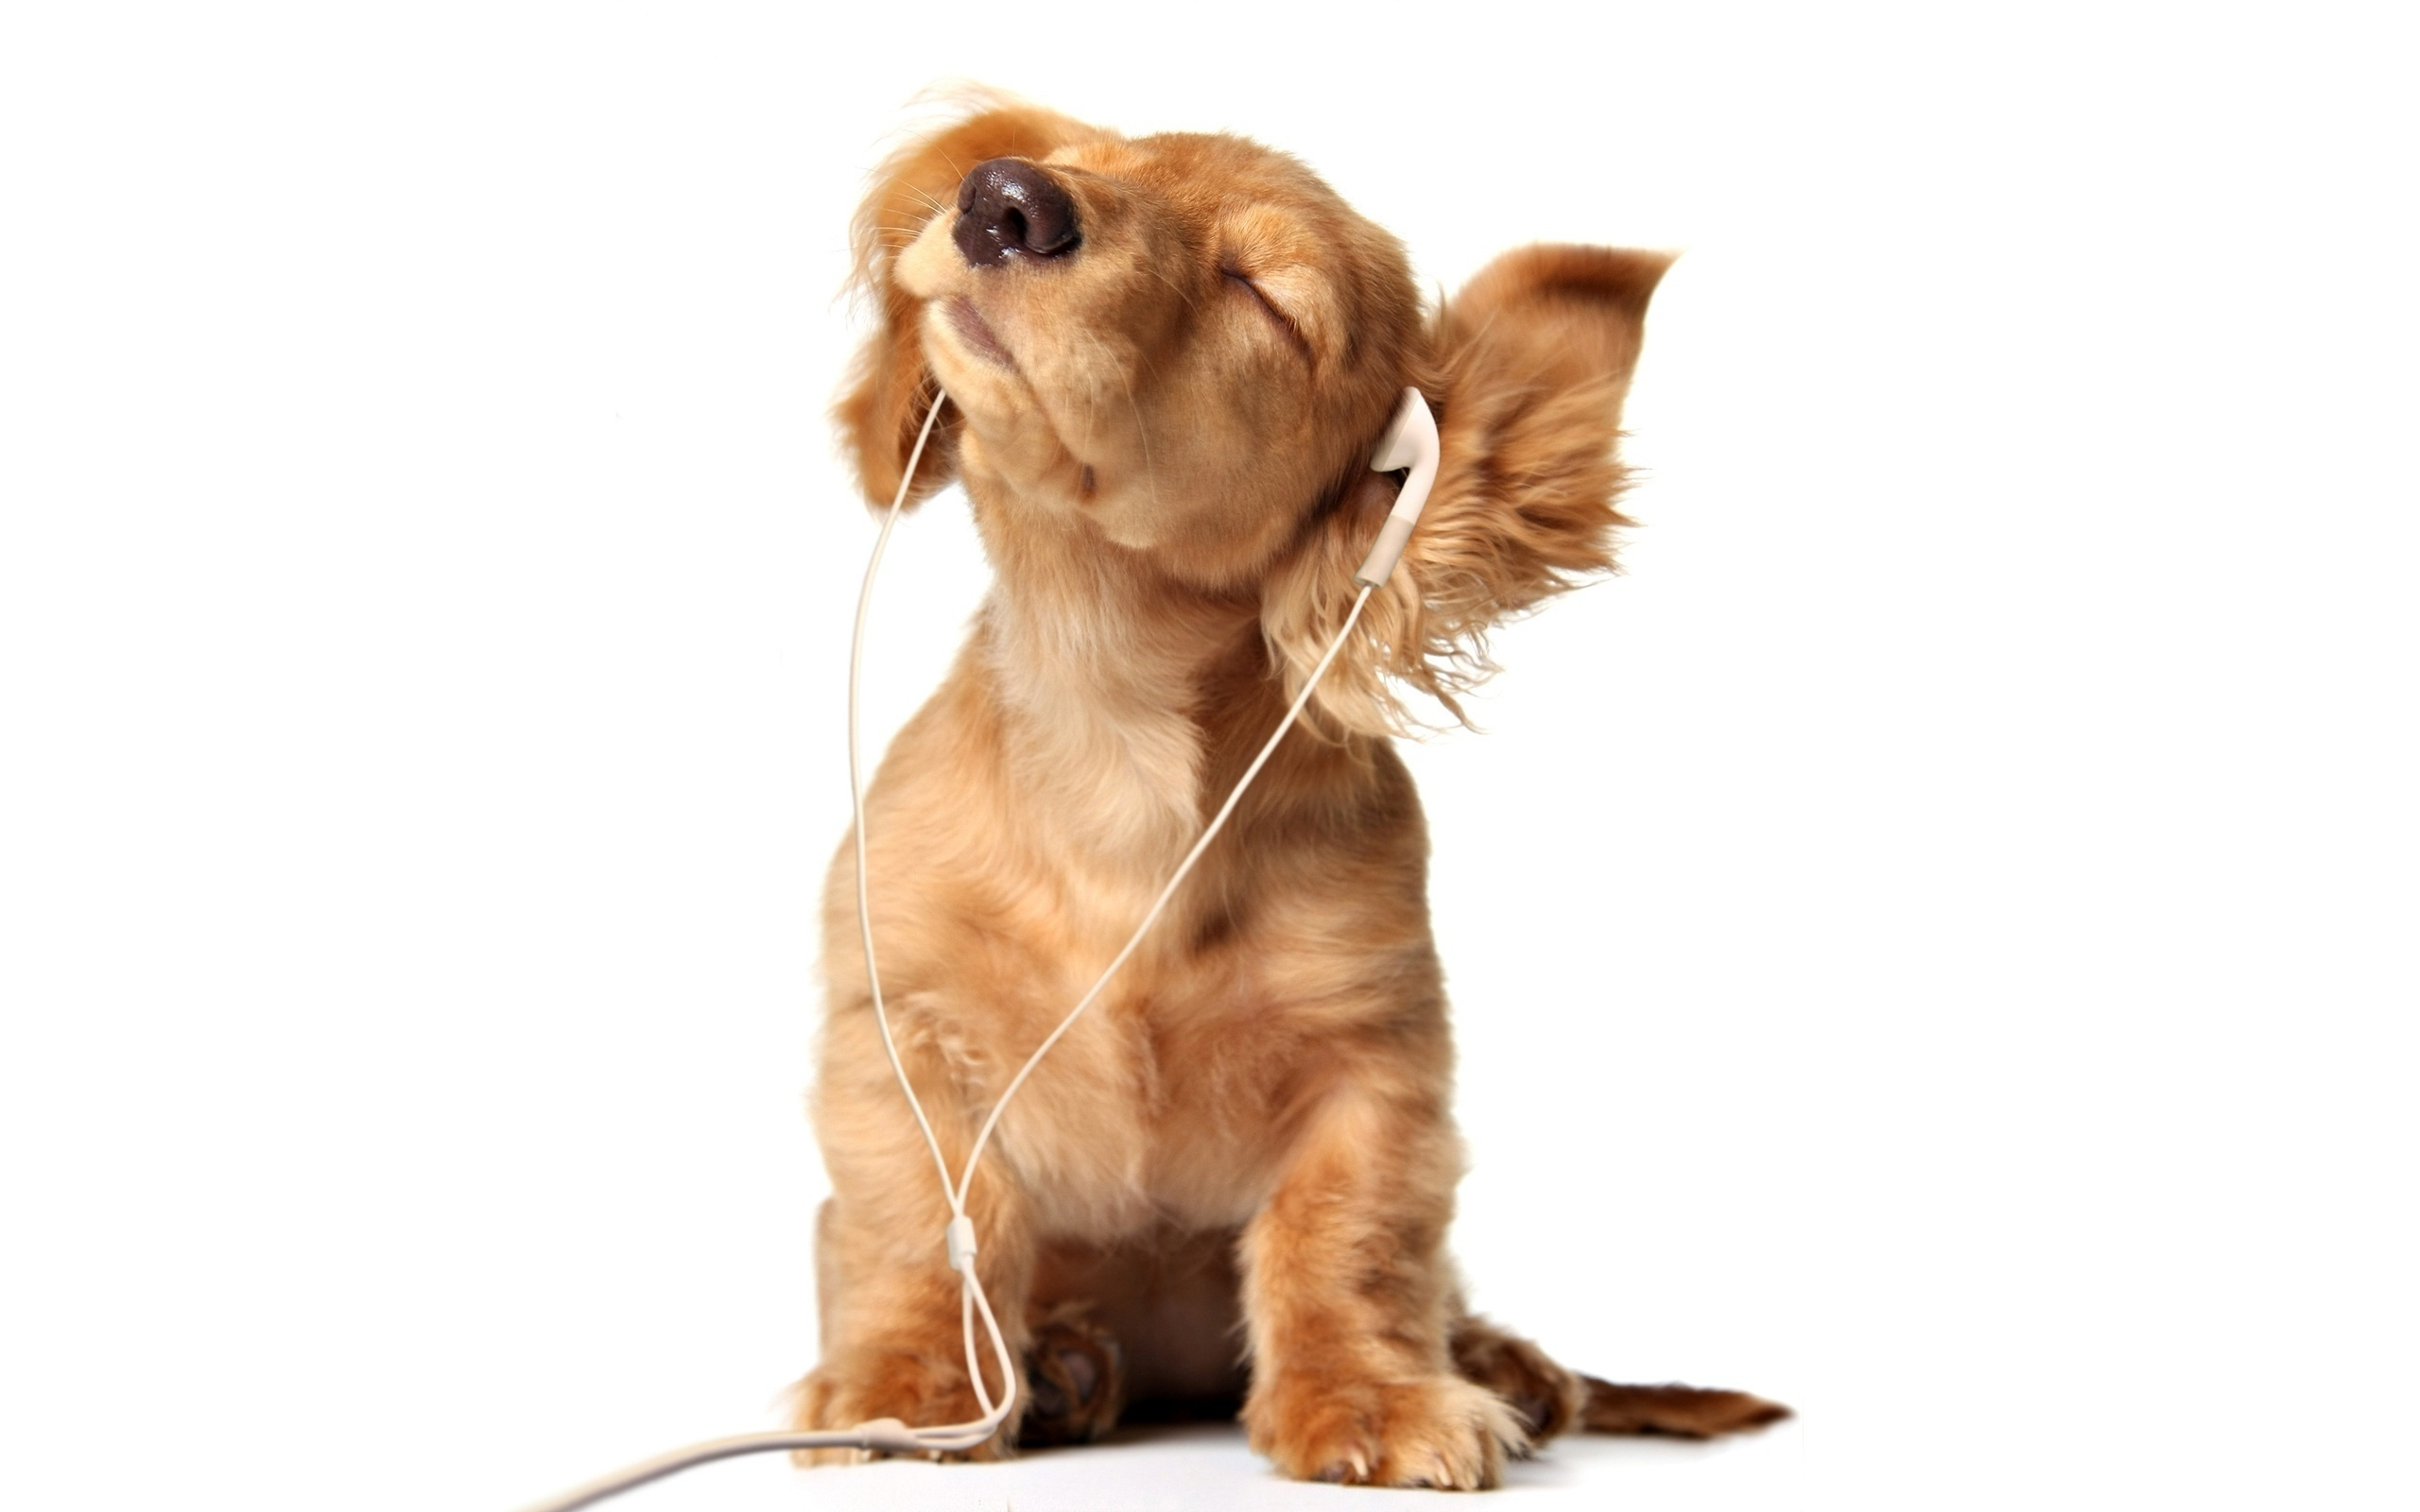 baldeet   dog ears  puppy  headphones  bow wow ry ryy HD Wallpaper